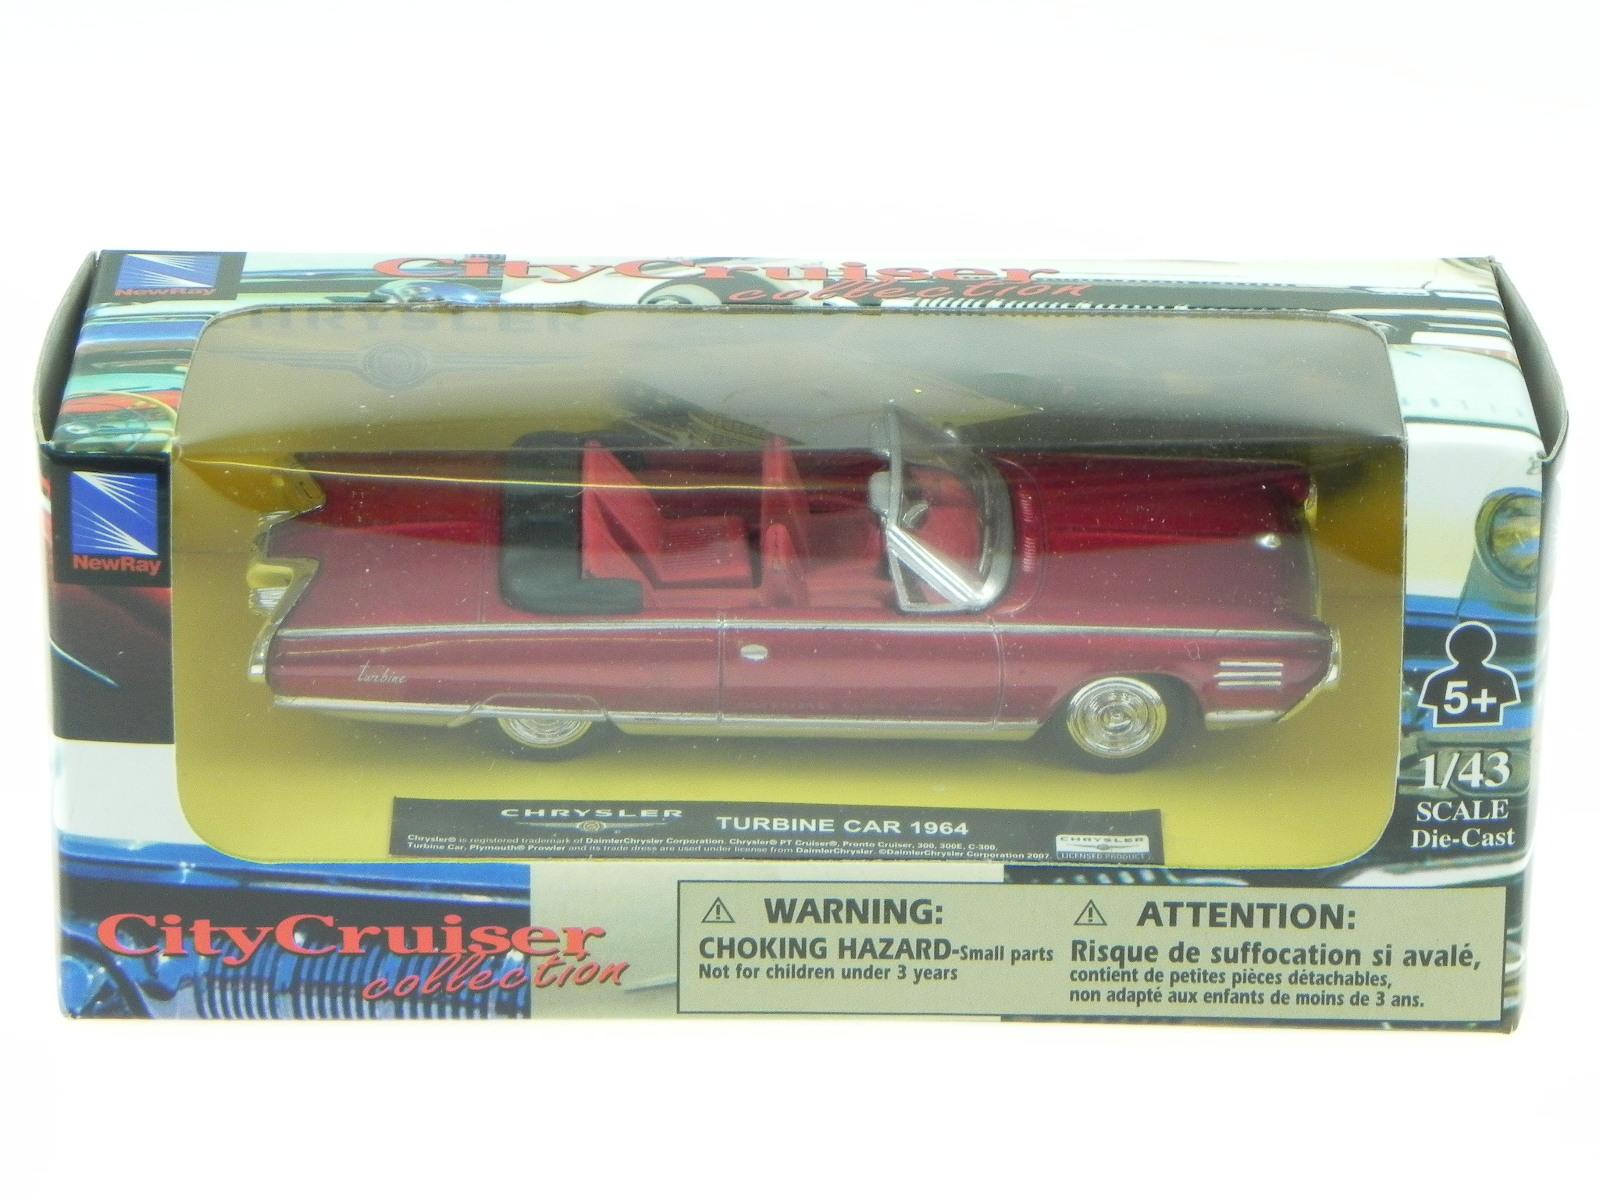 Chrysler Turbine Car Convertible 1964 Red Modelcar Newray 1 43 Ebay